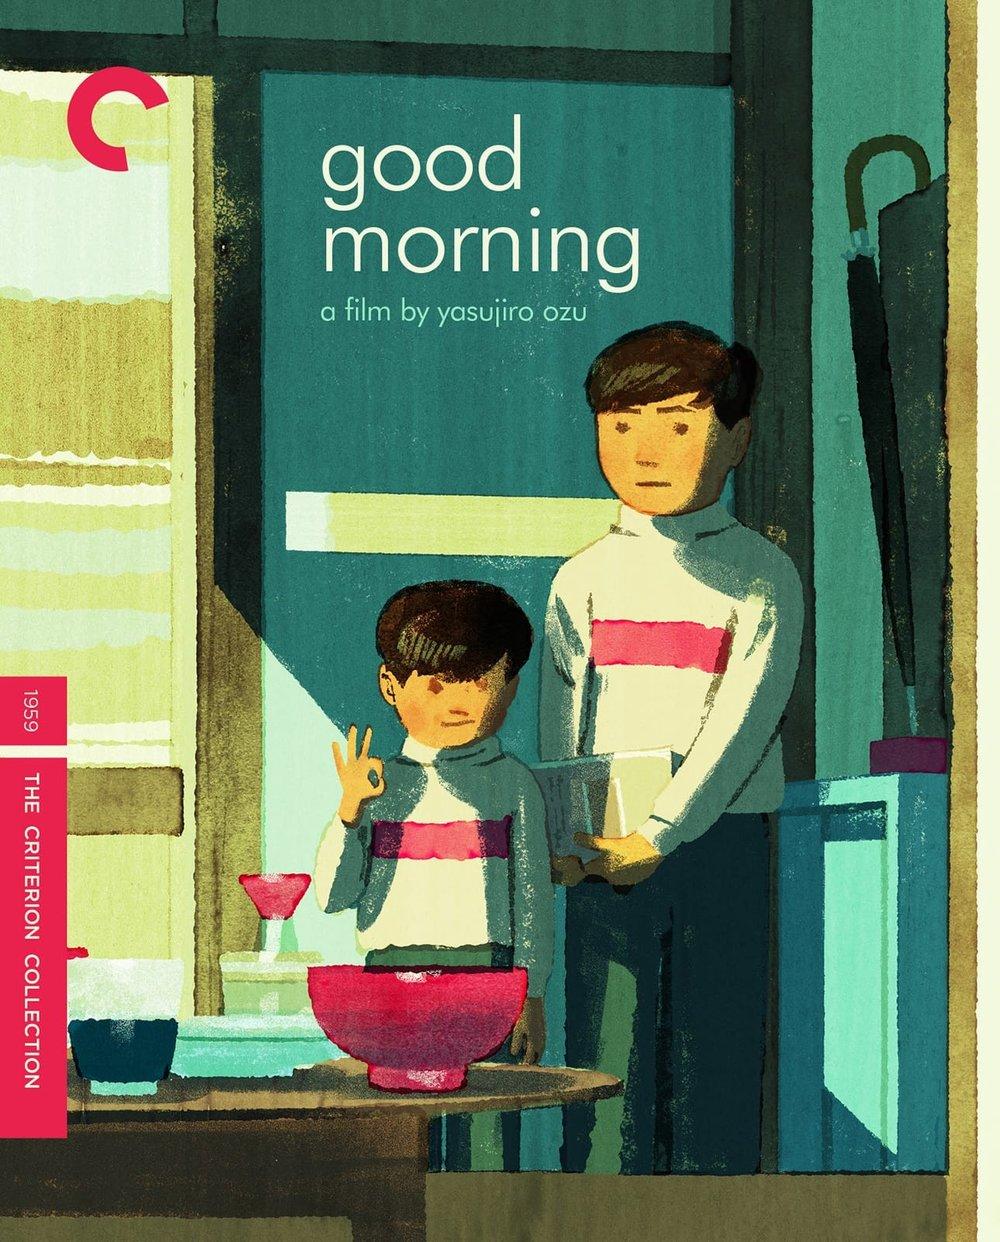 Good Morning (1959) - Directed by: Yasujiro OzuStarring: Keji Sada, Yoshiko Kuga, Chishu RyuRated: NR (Suggested PG for Some Rude Humor)Running Time: 1 h 34 mTMM Score: 3.5 stars out of 5STRENGTHS: Aesthetic, Charm, Writing, DirectingWEAKNESSES: Pacing